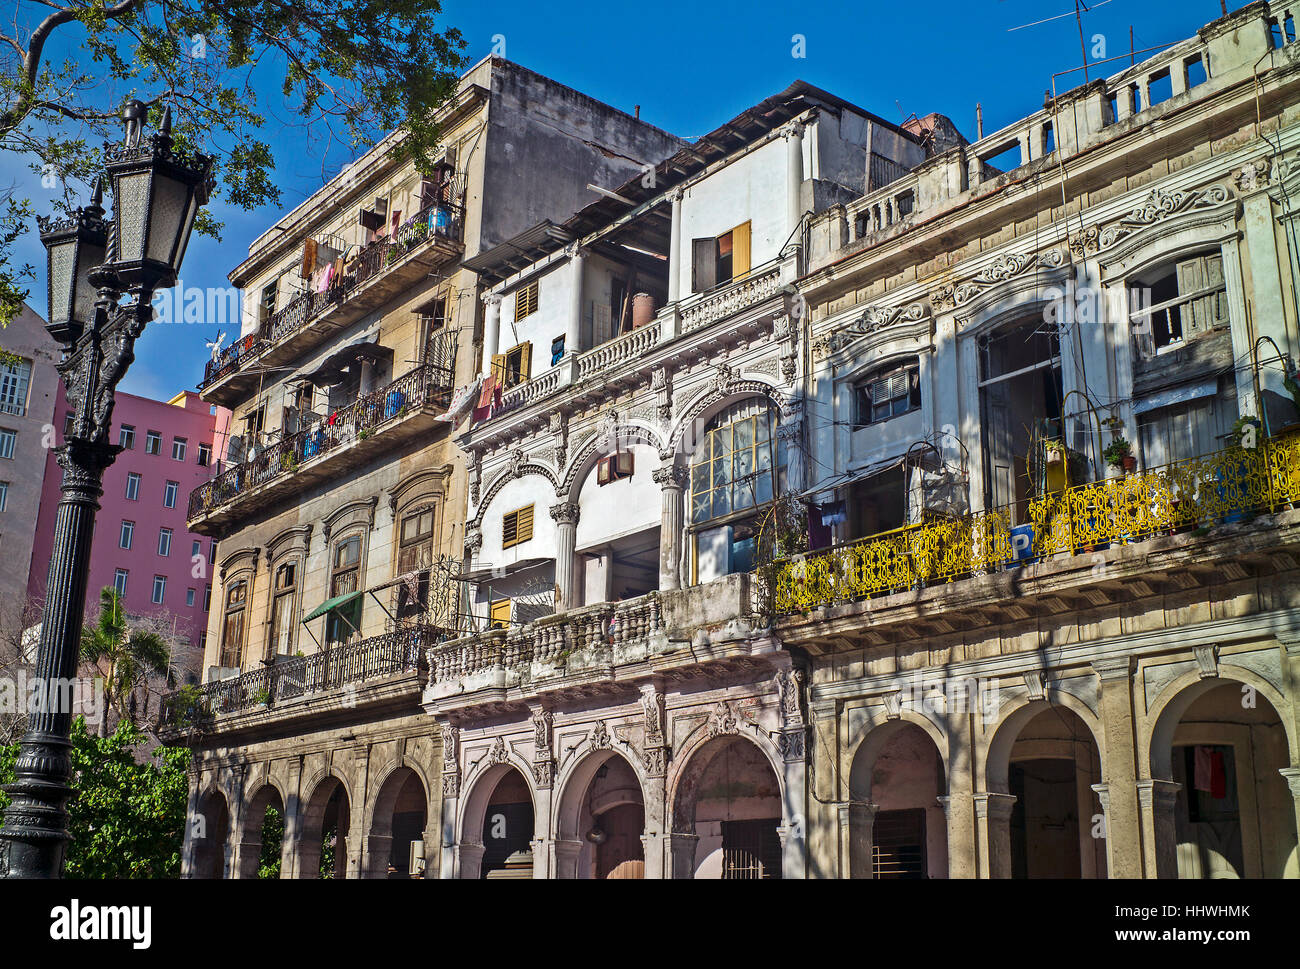 La Floridita bar in old Havana, drinking spot of Ernest Hemingway  home of Daiquiris and Mojitos old havana Cuba Stock Photo